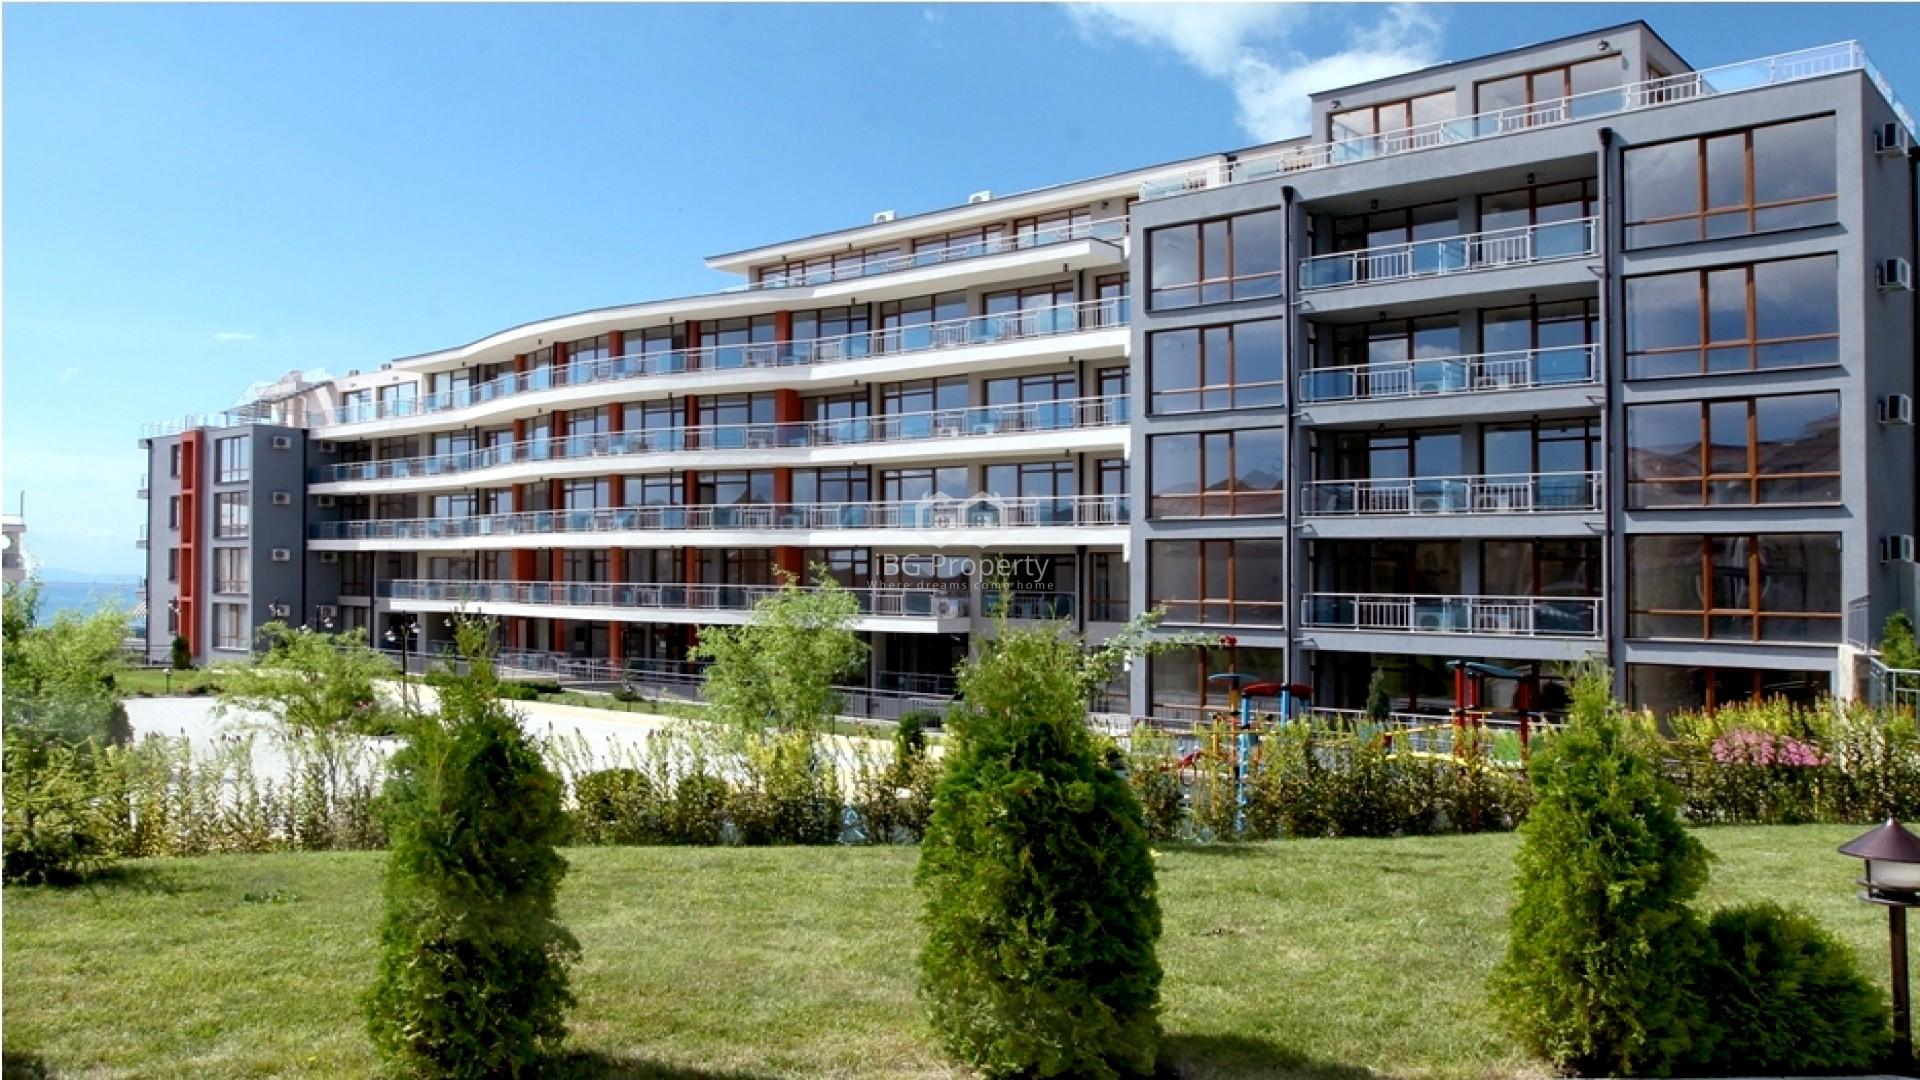 Двустаен апартамент Свети влас 68.36 кв.м